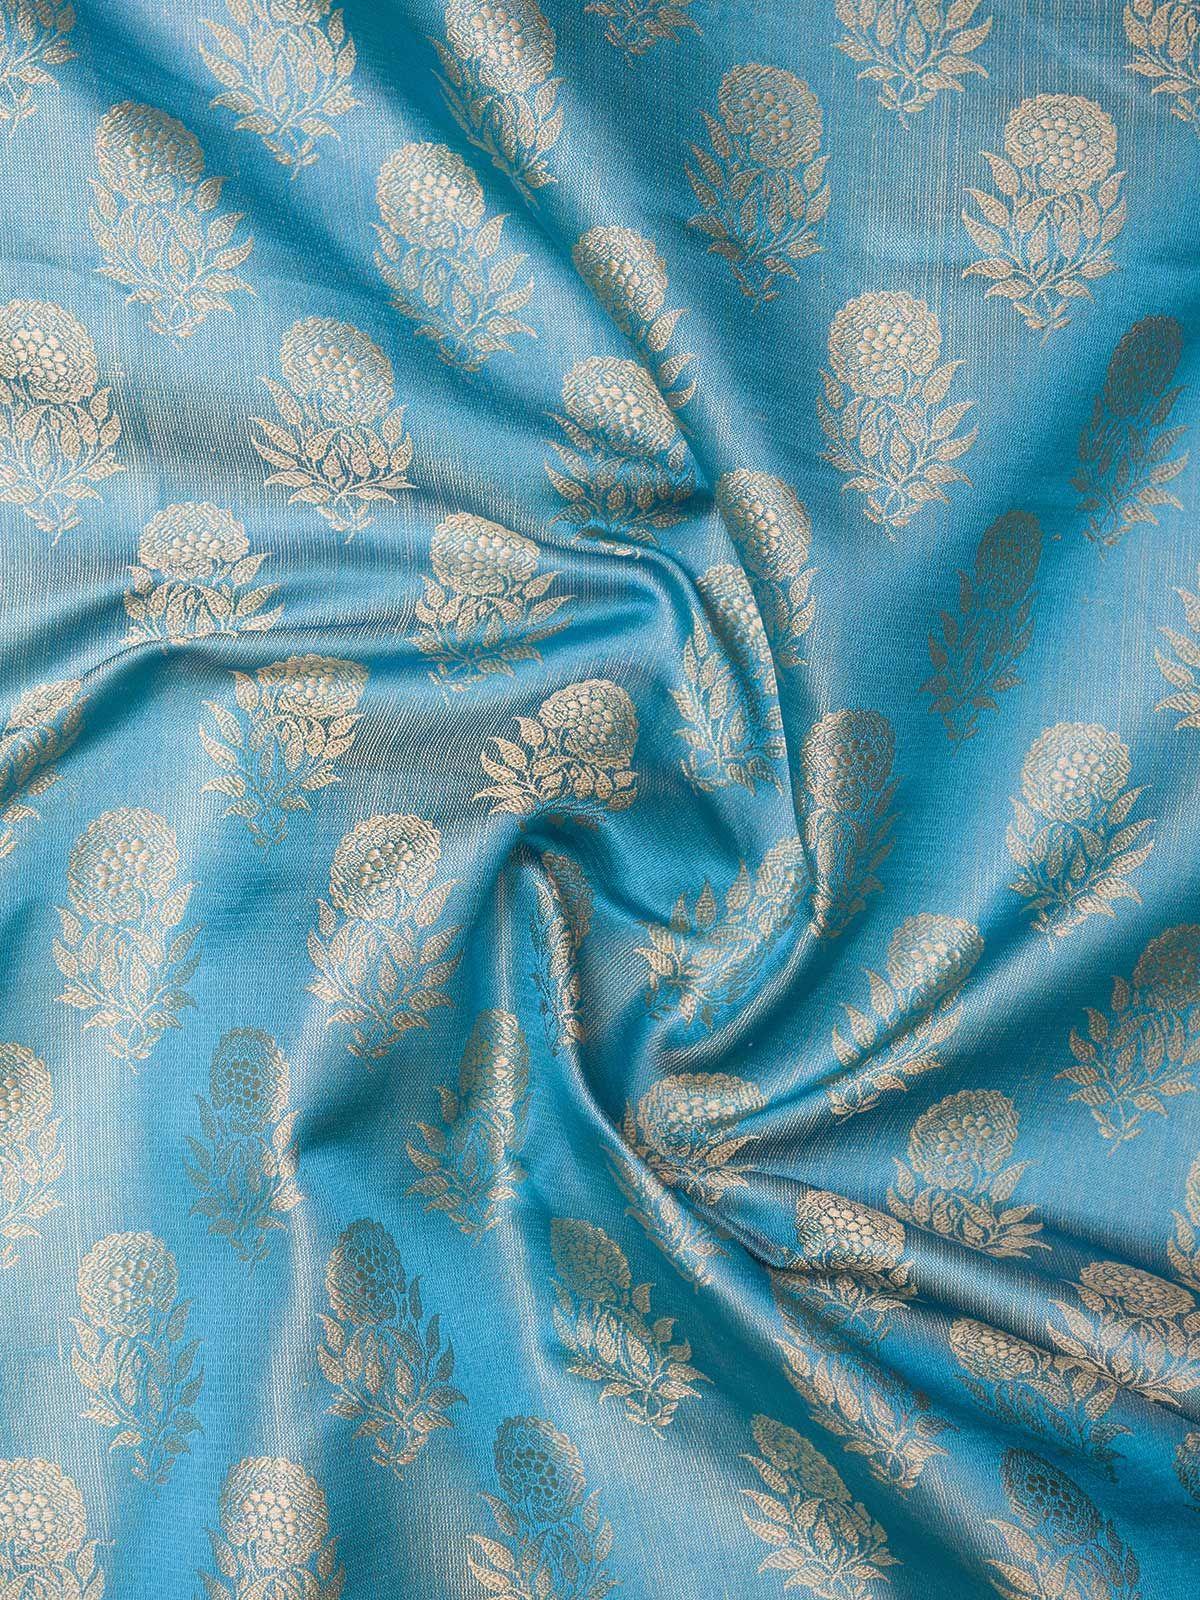 Blue and Grey Banarasi Tanchoi  Silk Fabric